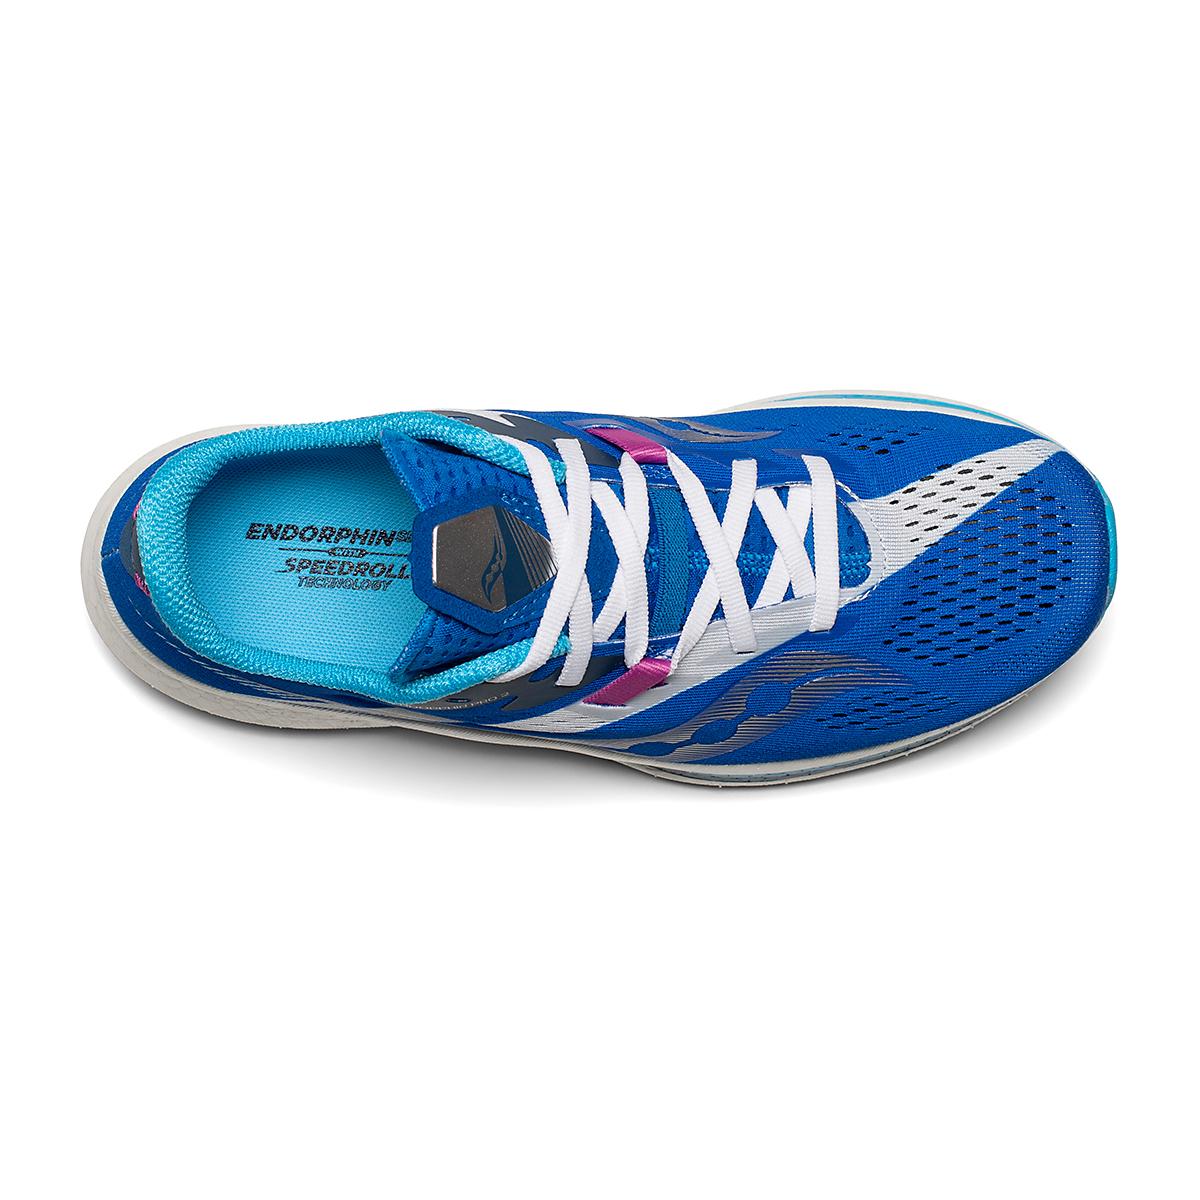 Women's Saucony Endorphin Pro 2 Running Shoe - Color: Royal/White - Size: 5 - Width: Regular, Royal/White, large, image 3